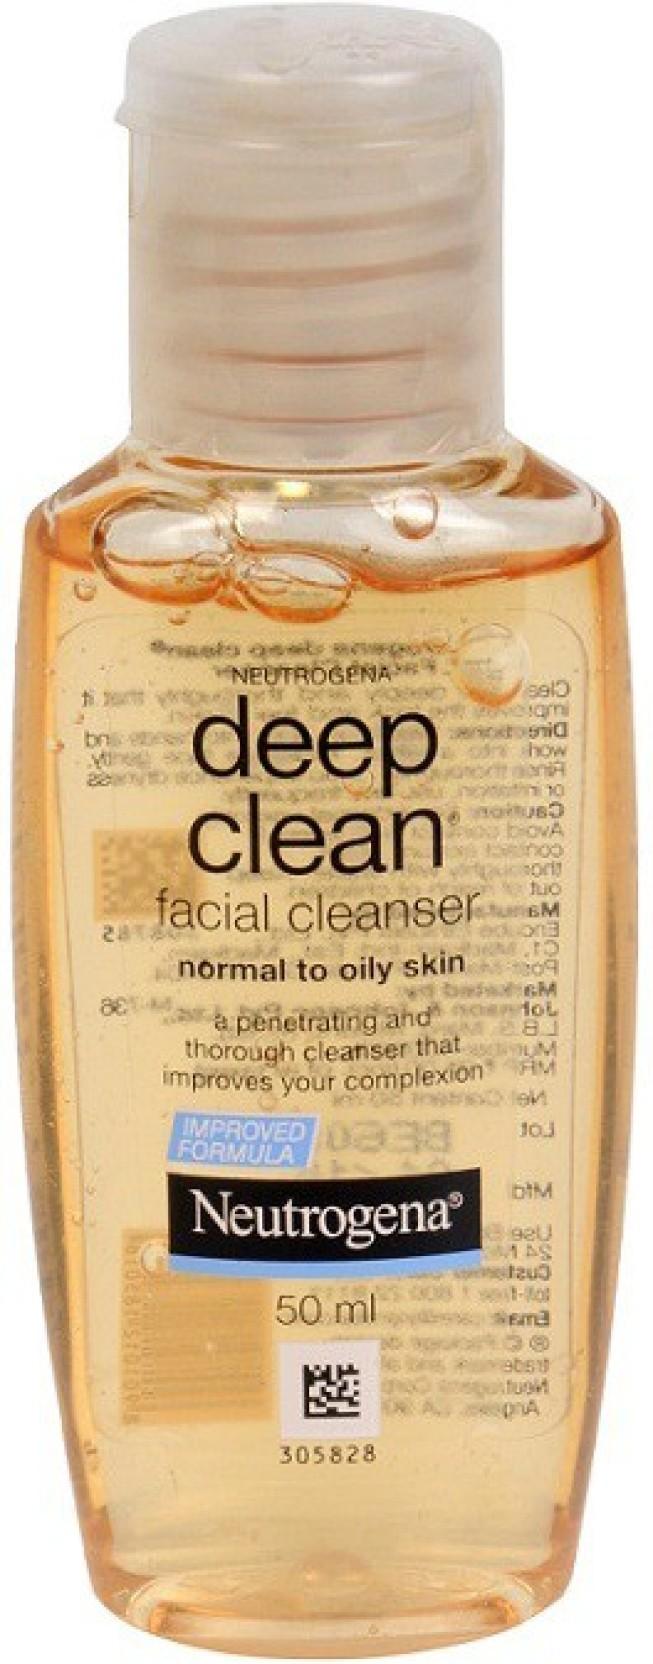 Neutrogena Deep Clean Facial Cleanser Price In India Buy Original Add To Cart